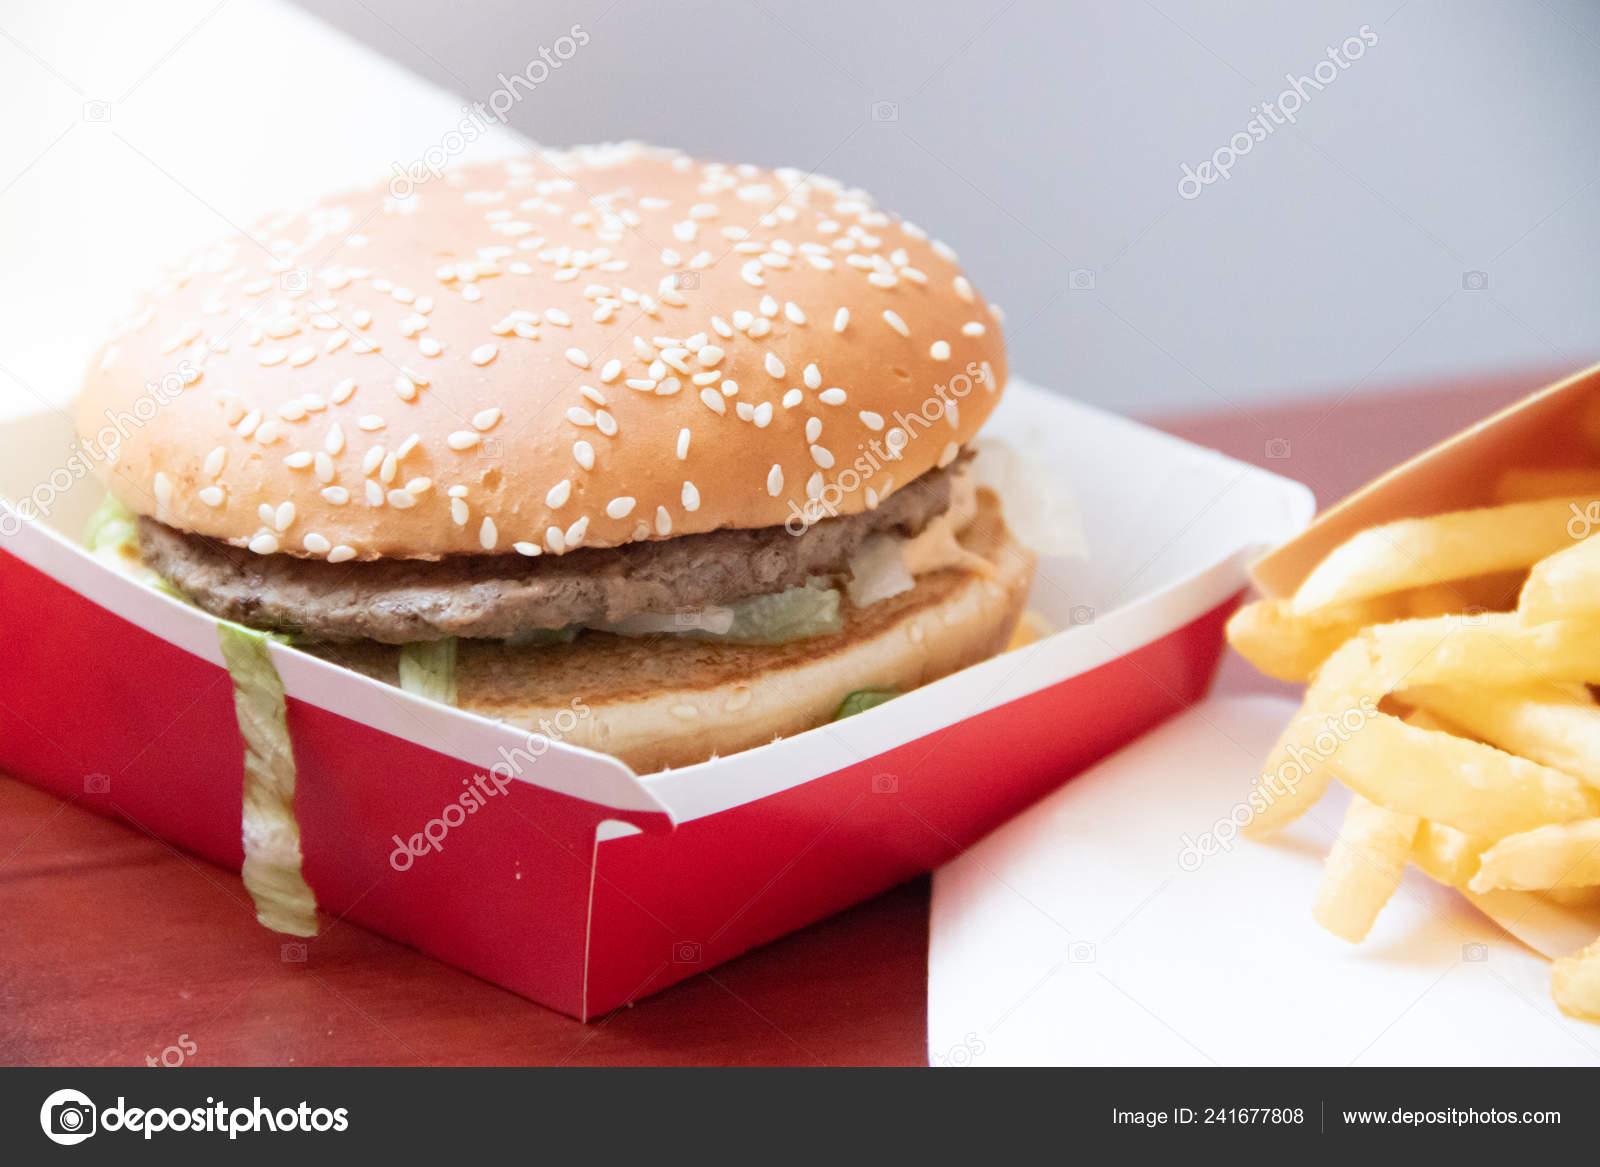 Big Mac French Fries Mcdonalds Russia Unhealthy Food